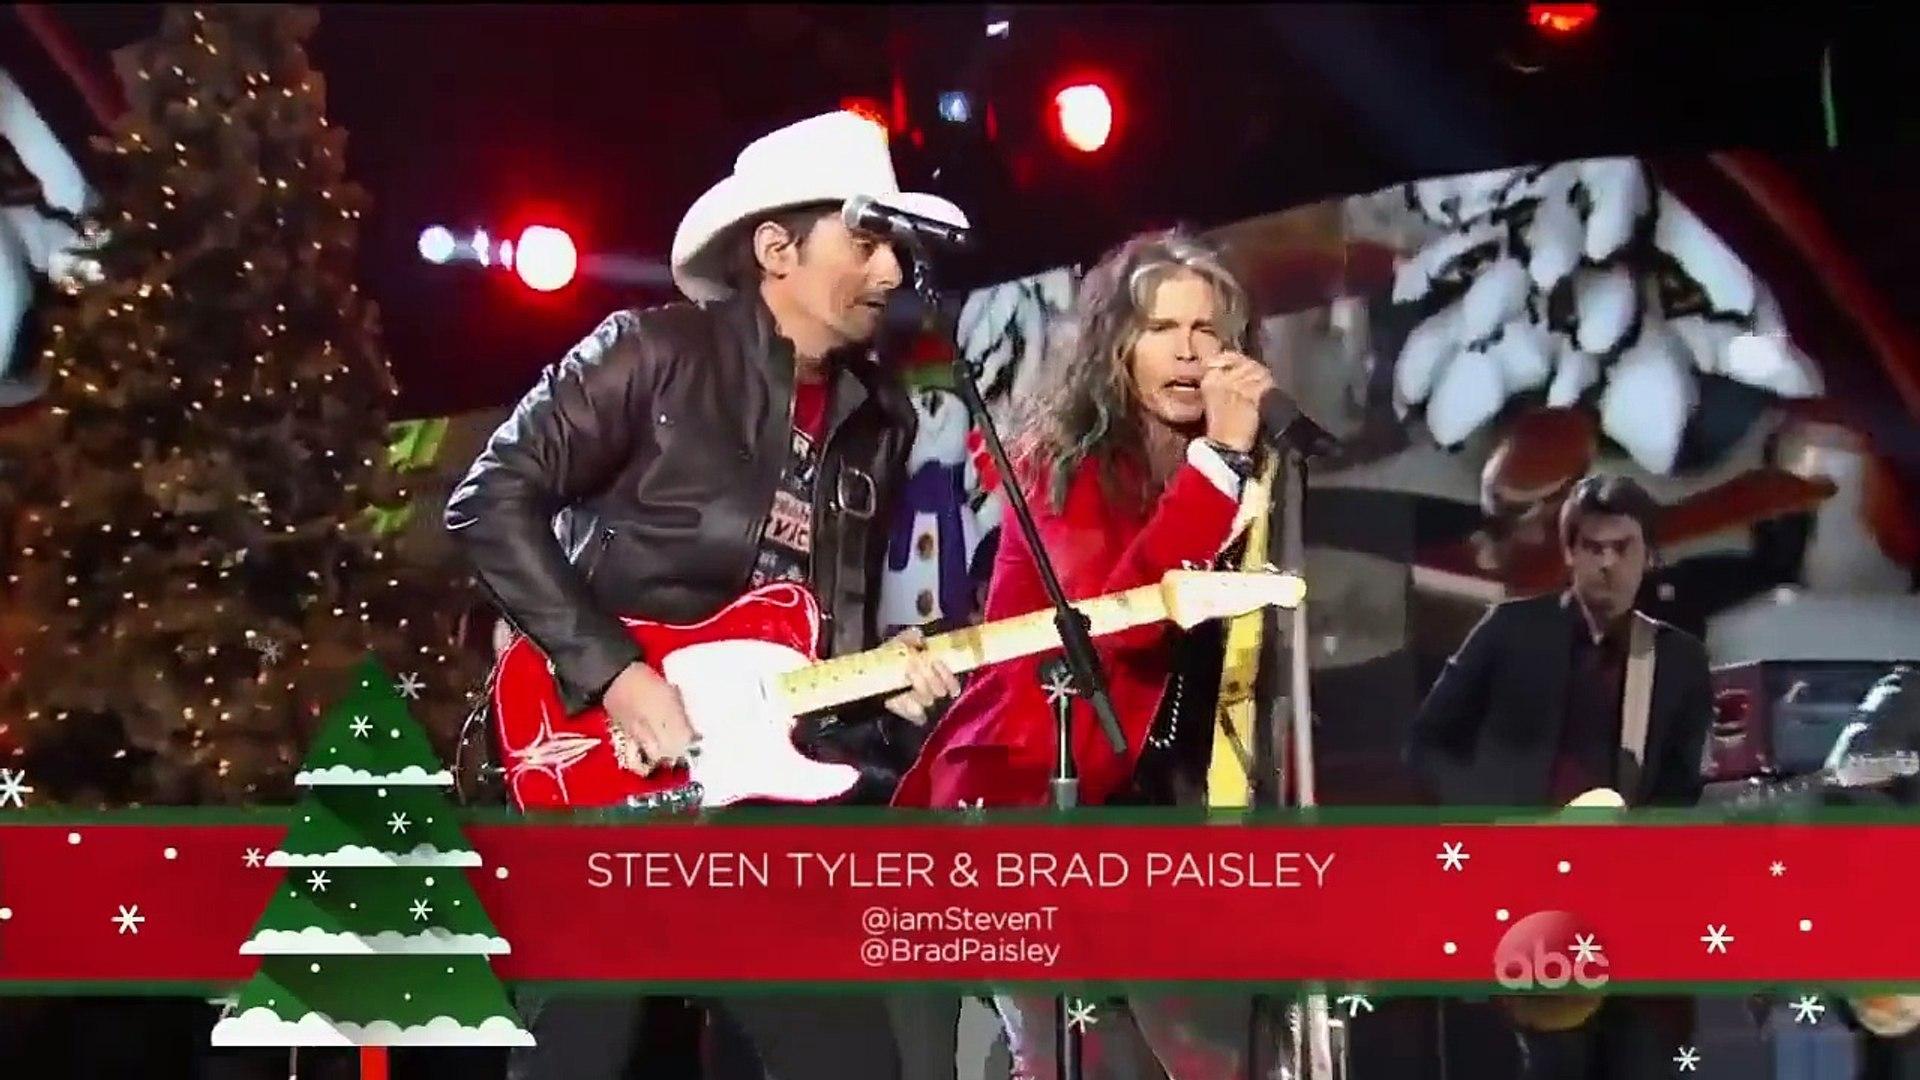 Brad Paisley Christmas.Steven Tyler Brad Paisley Run Run Rudolph Cma Country Christmas 2014